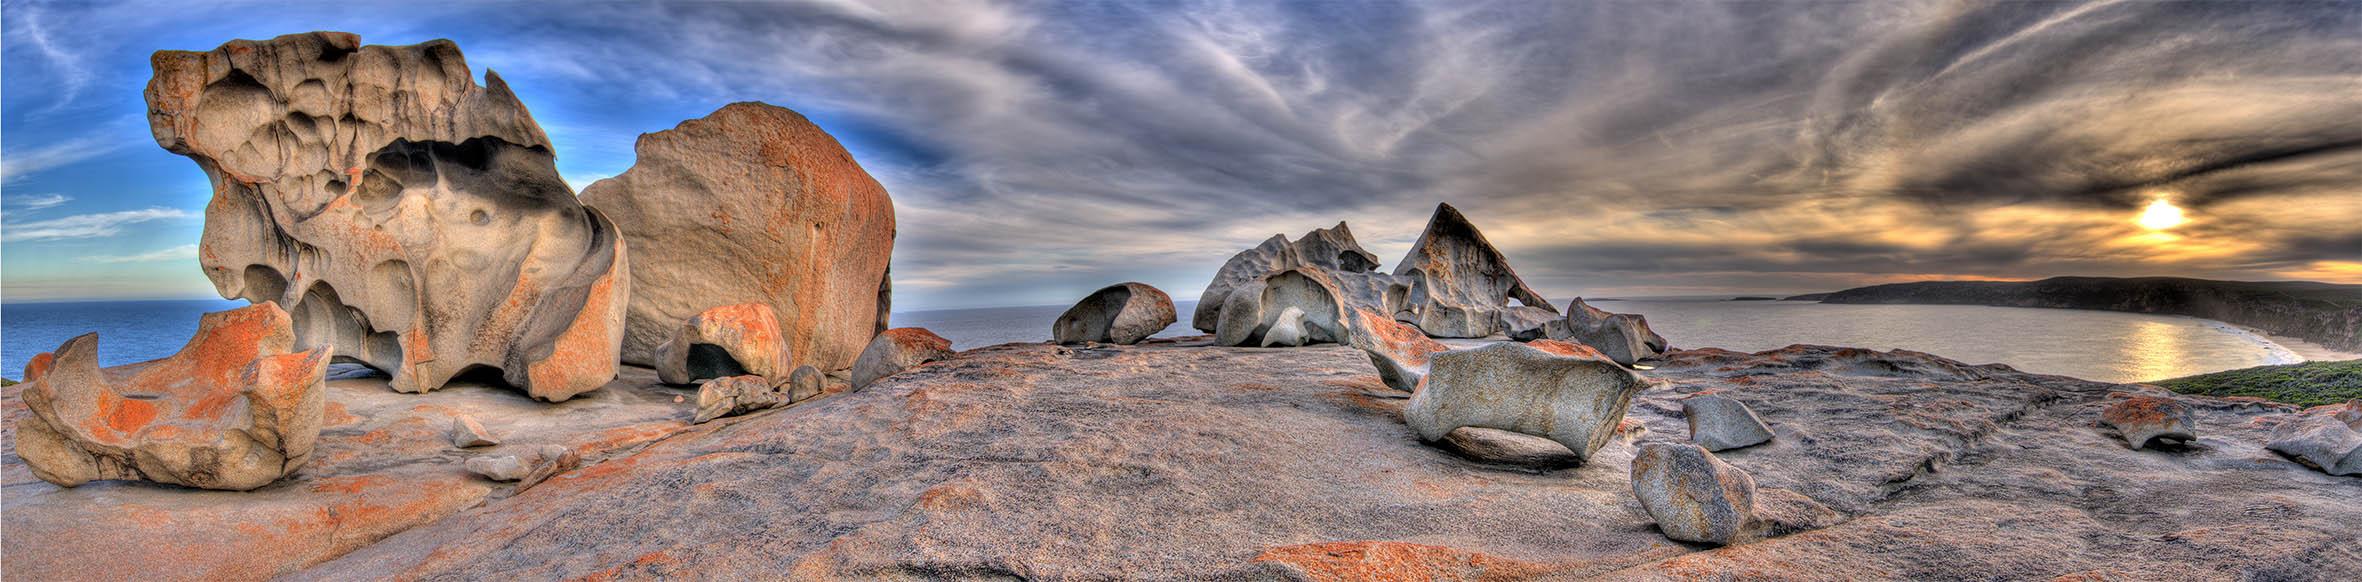 Flinders Chase National Park, Kangaroo Island by Ignacio Palacios